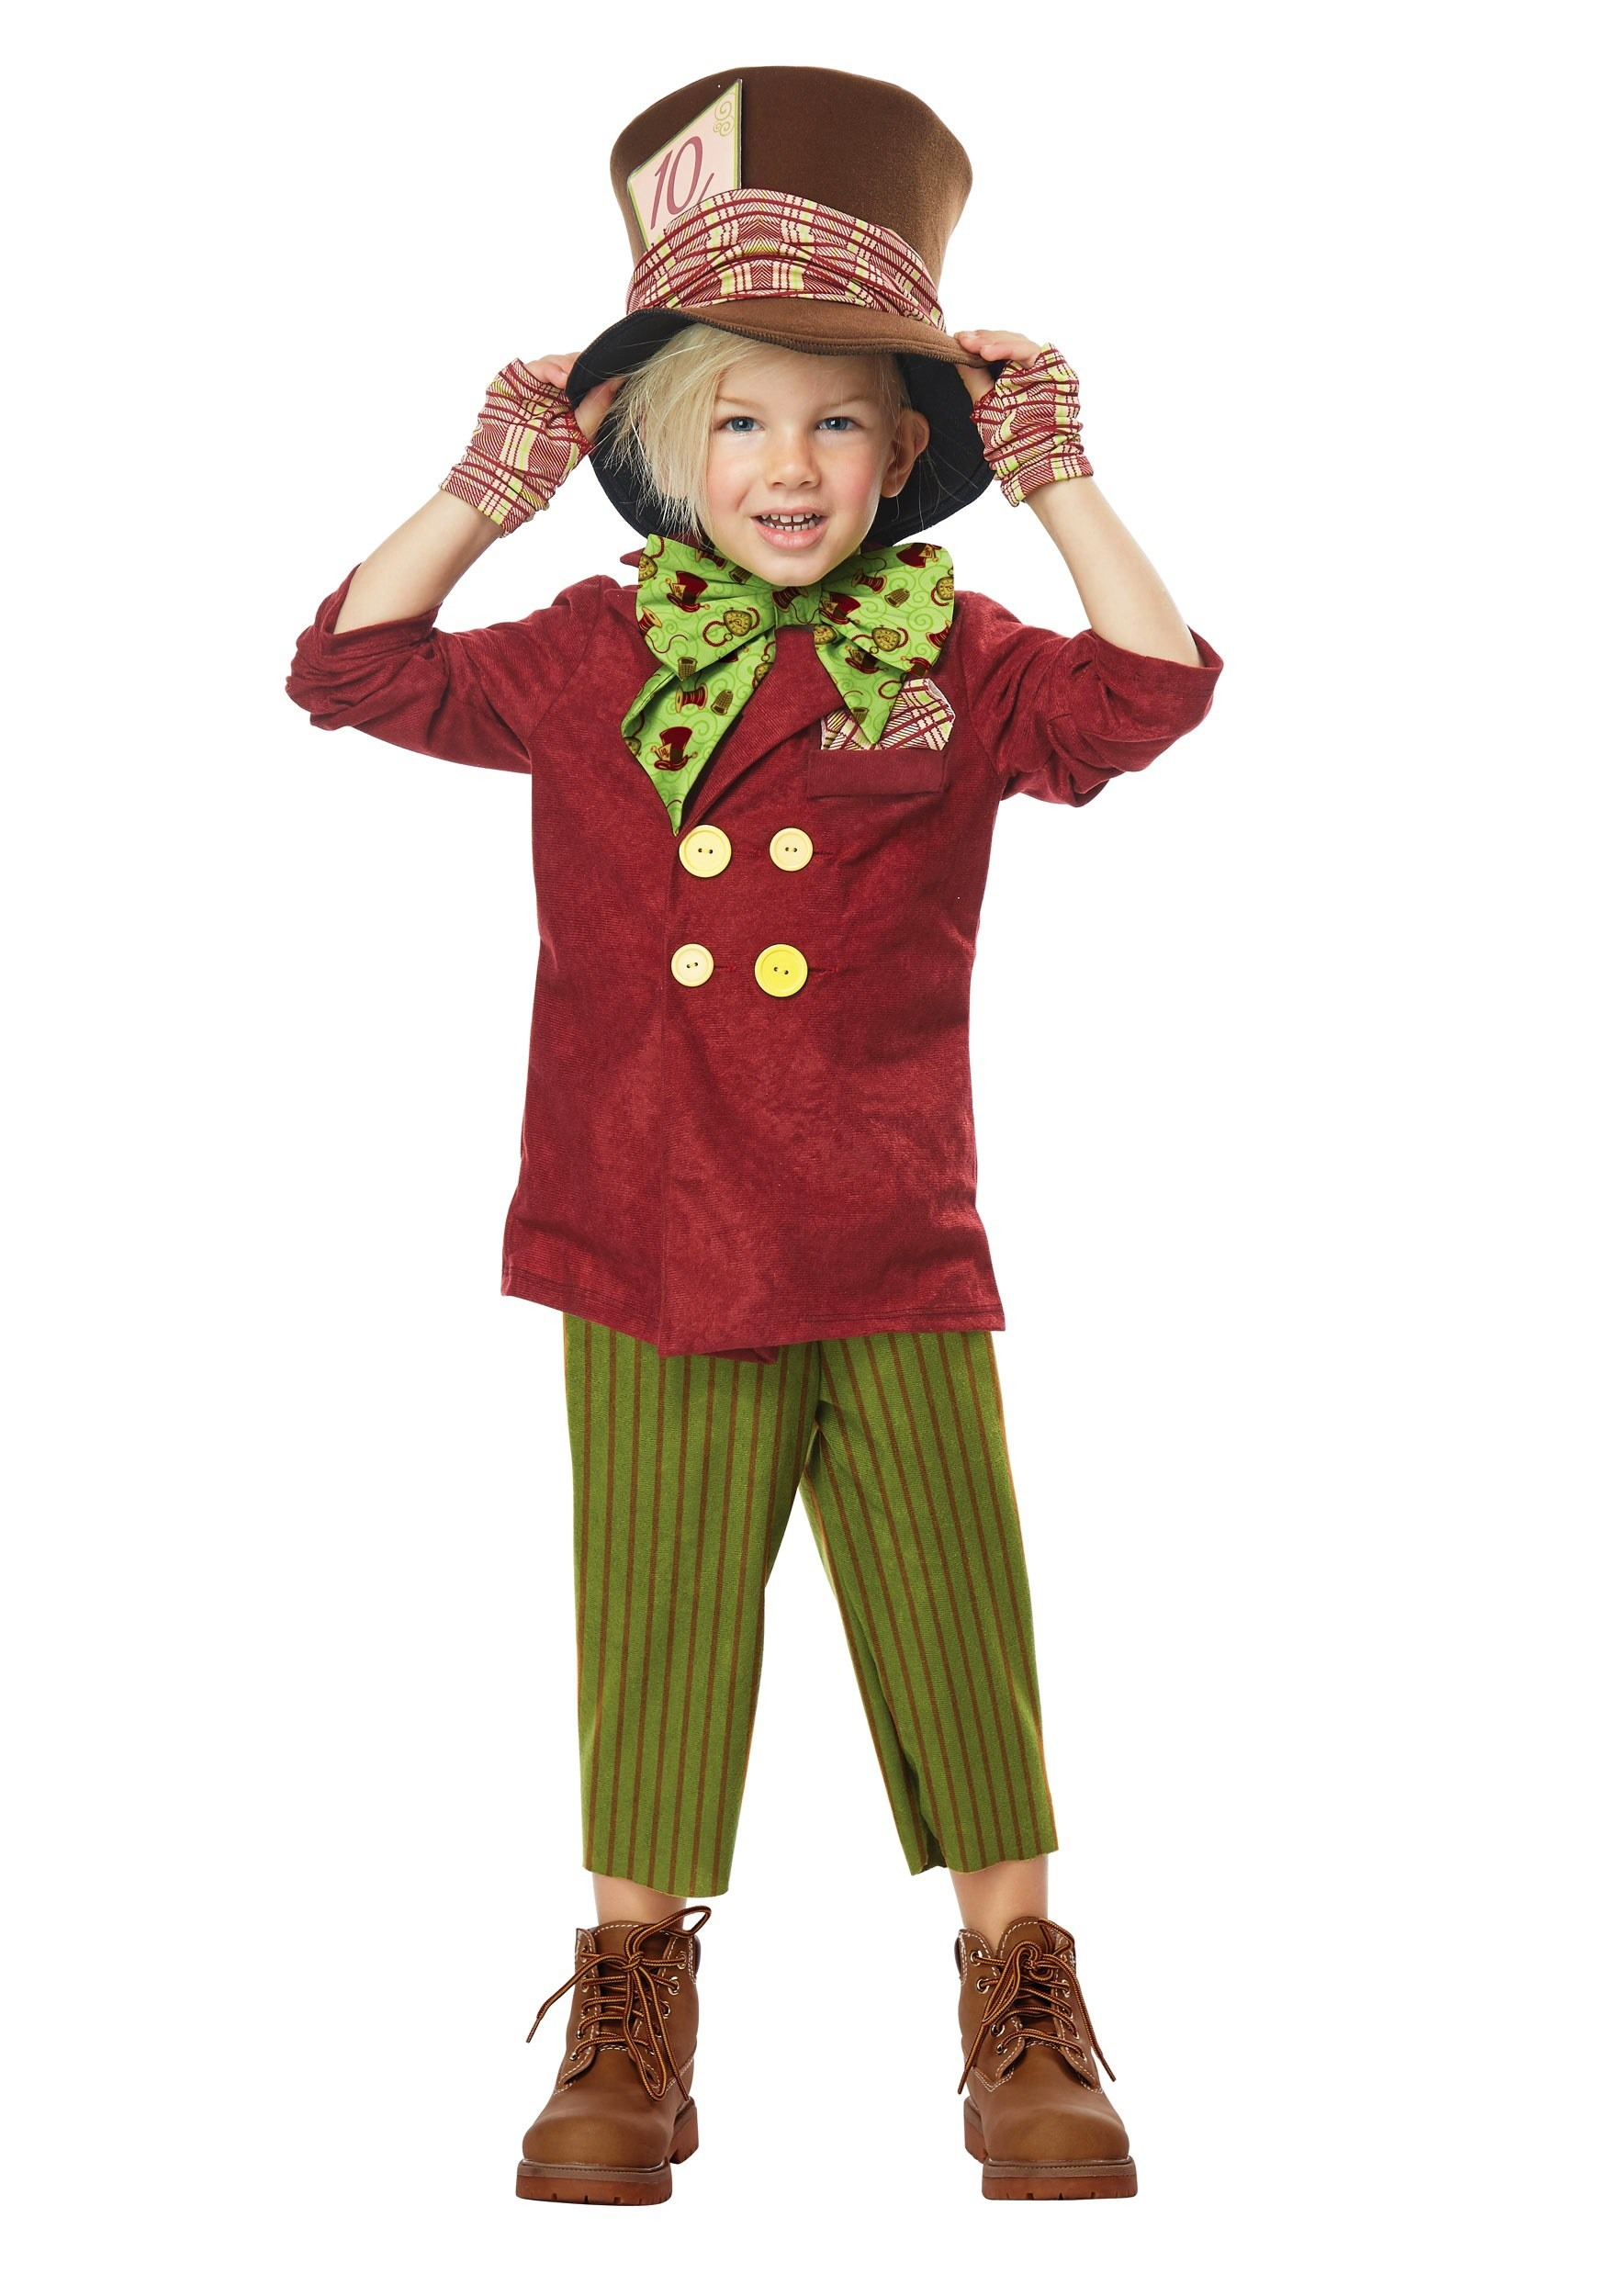 Lilu0027 Mad Hatter Toddler Costume  sc 1 st  Halloween Costumes & Mad Hatter Costumes - Alice in Wonderland Madhatter Halloween Costume